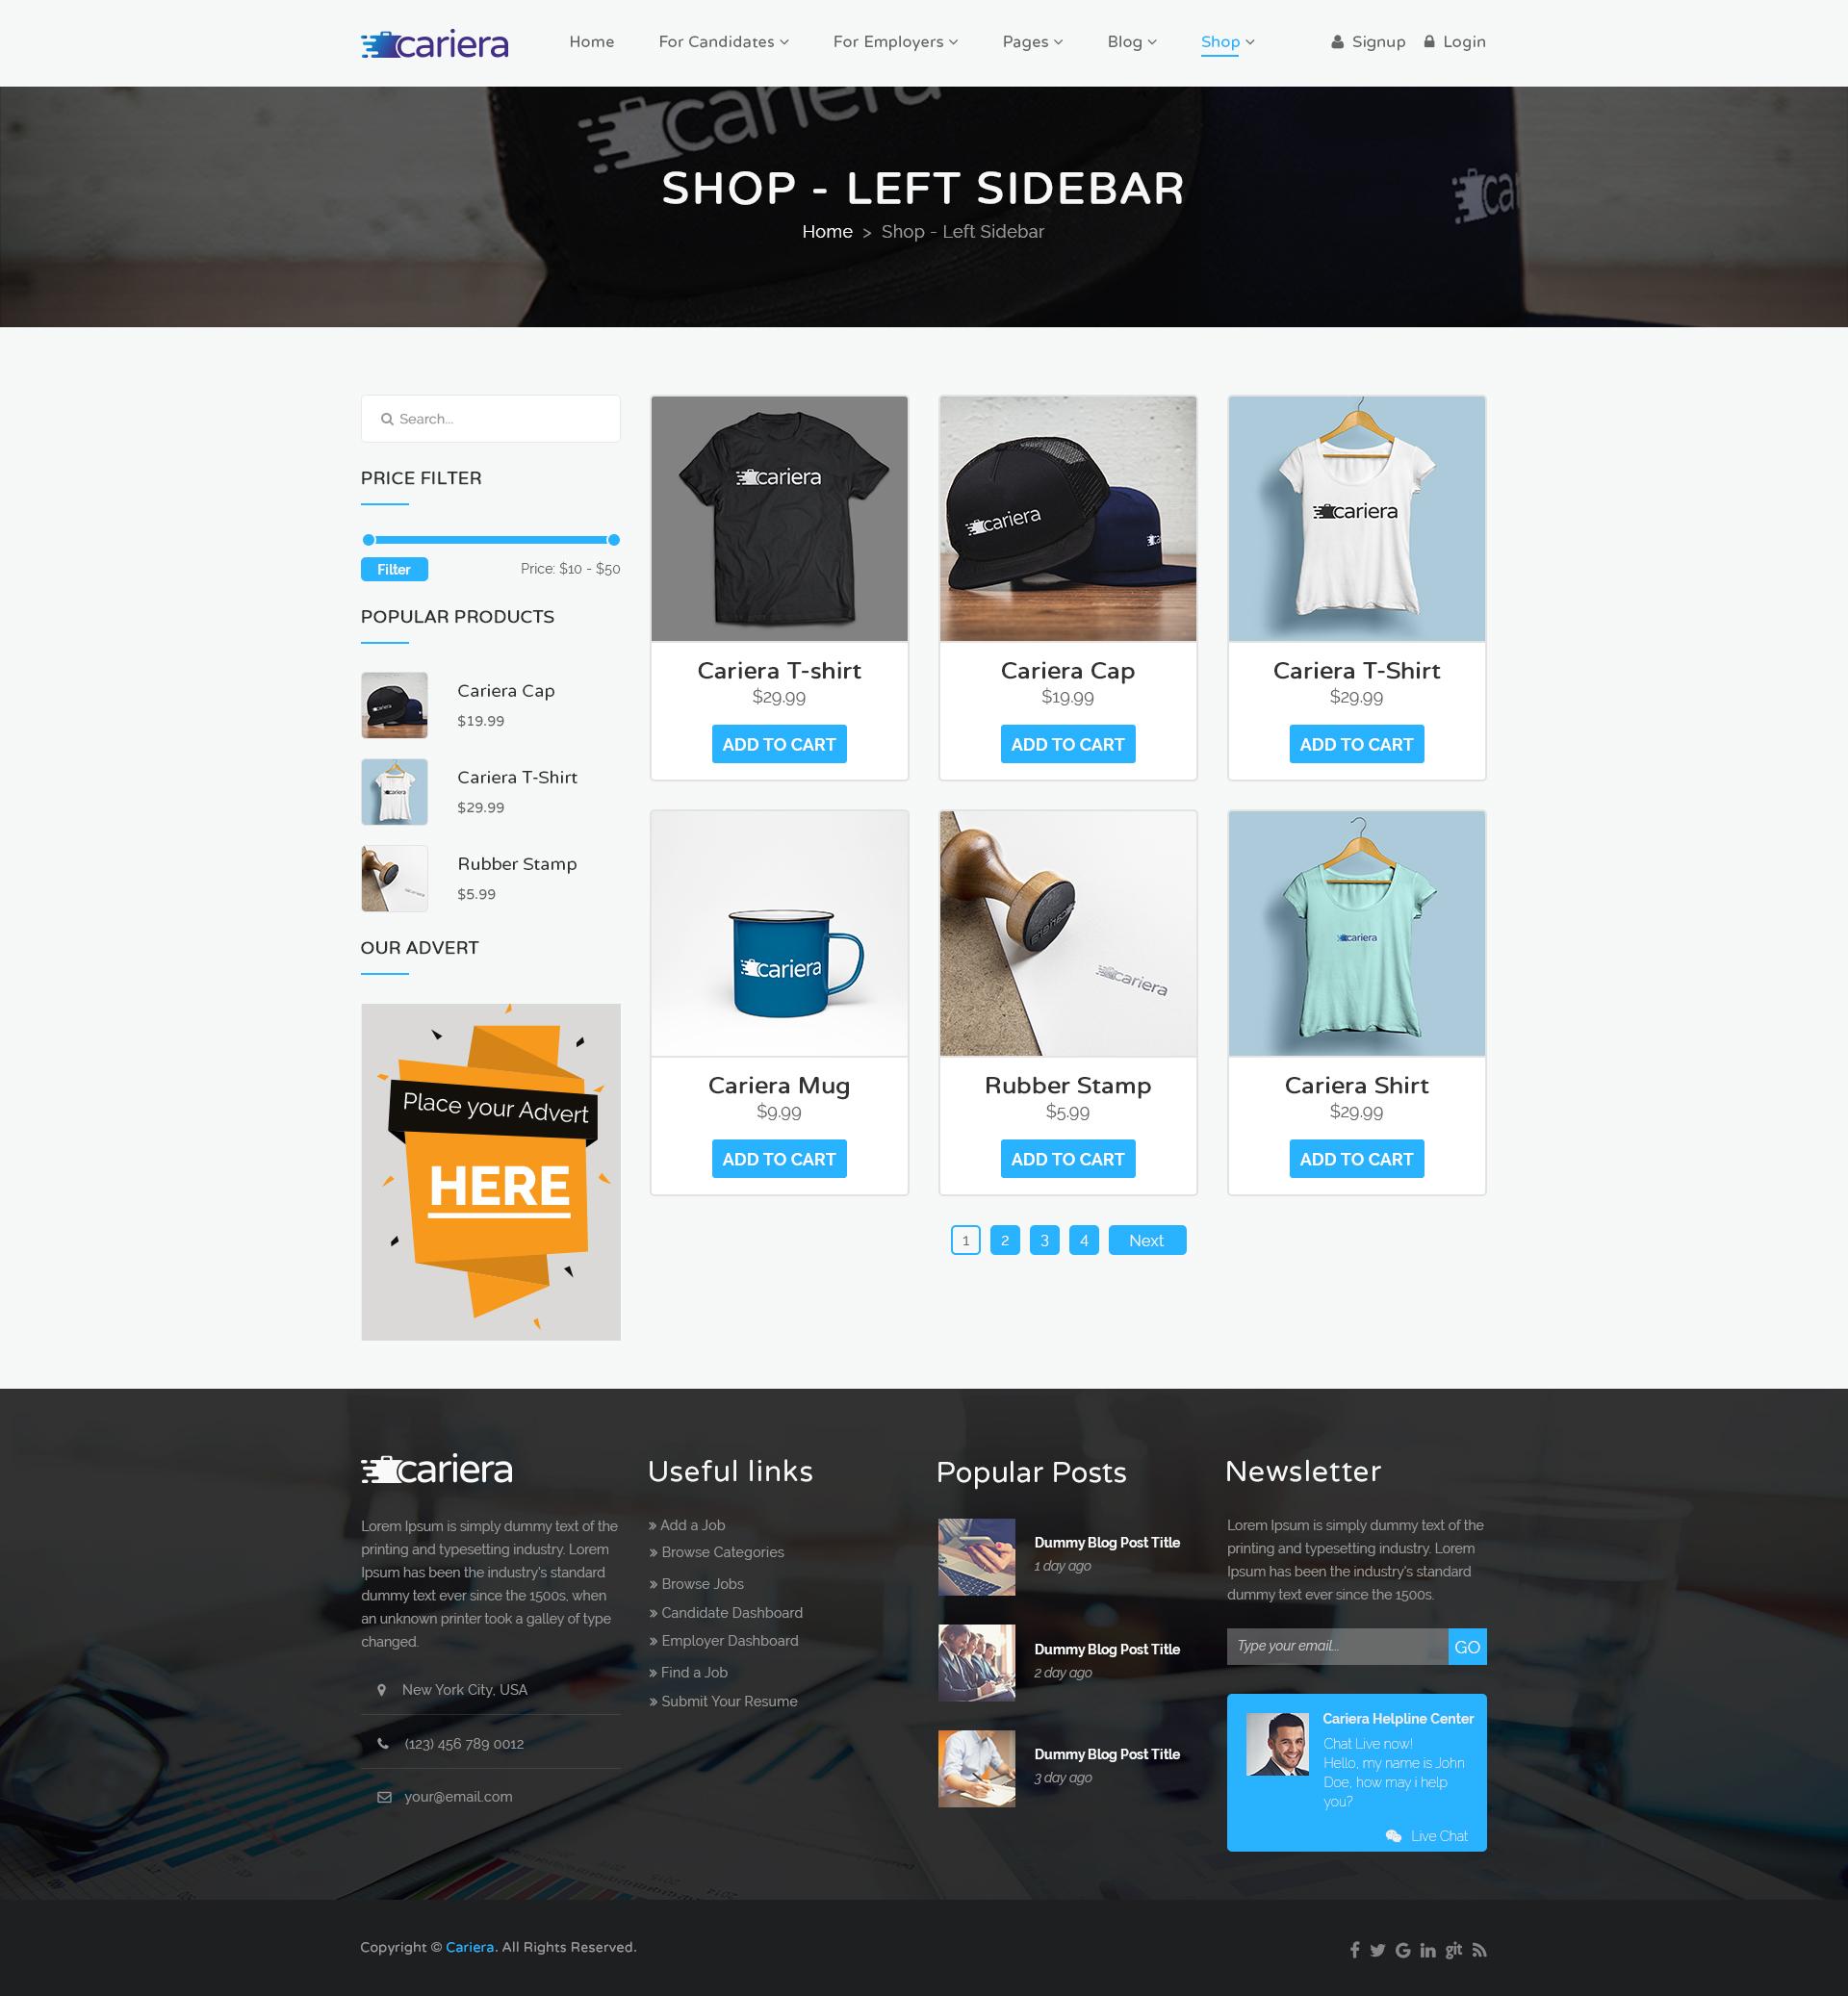 cariera - job board html template free download  Cariera Job Board PSD Template by gnodesign | ThemeForest